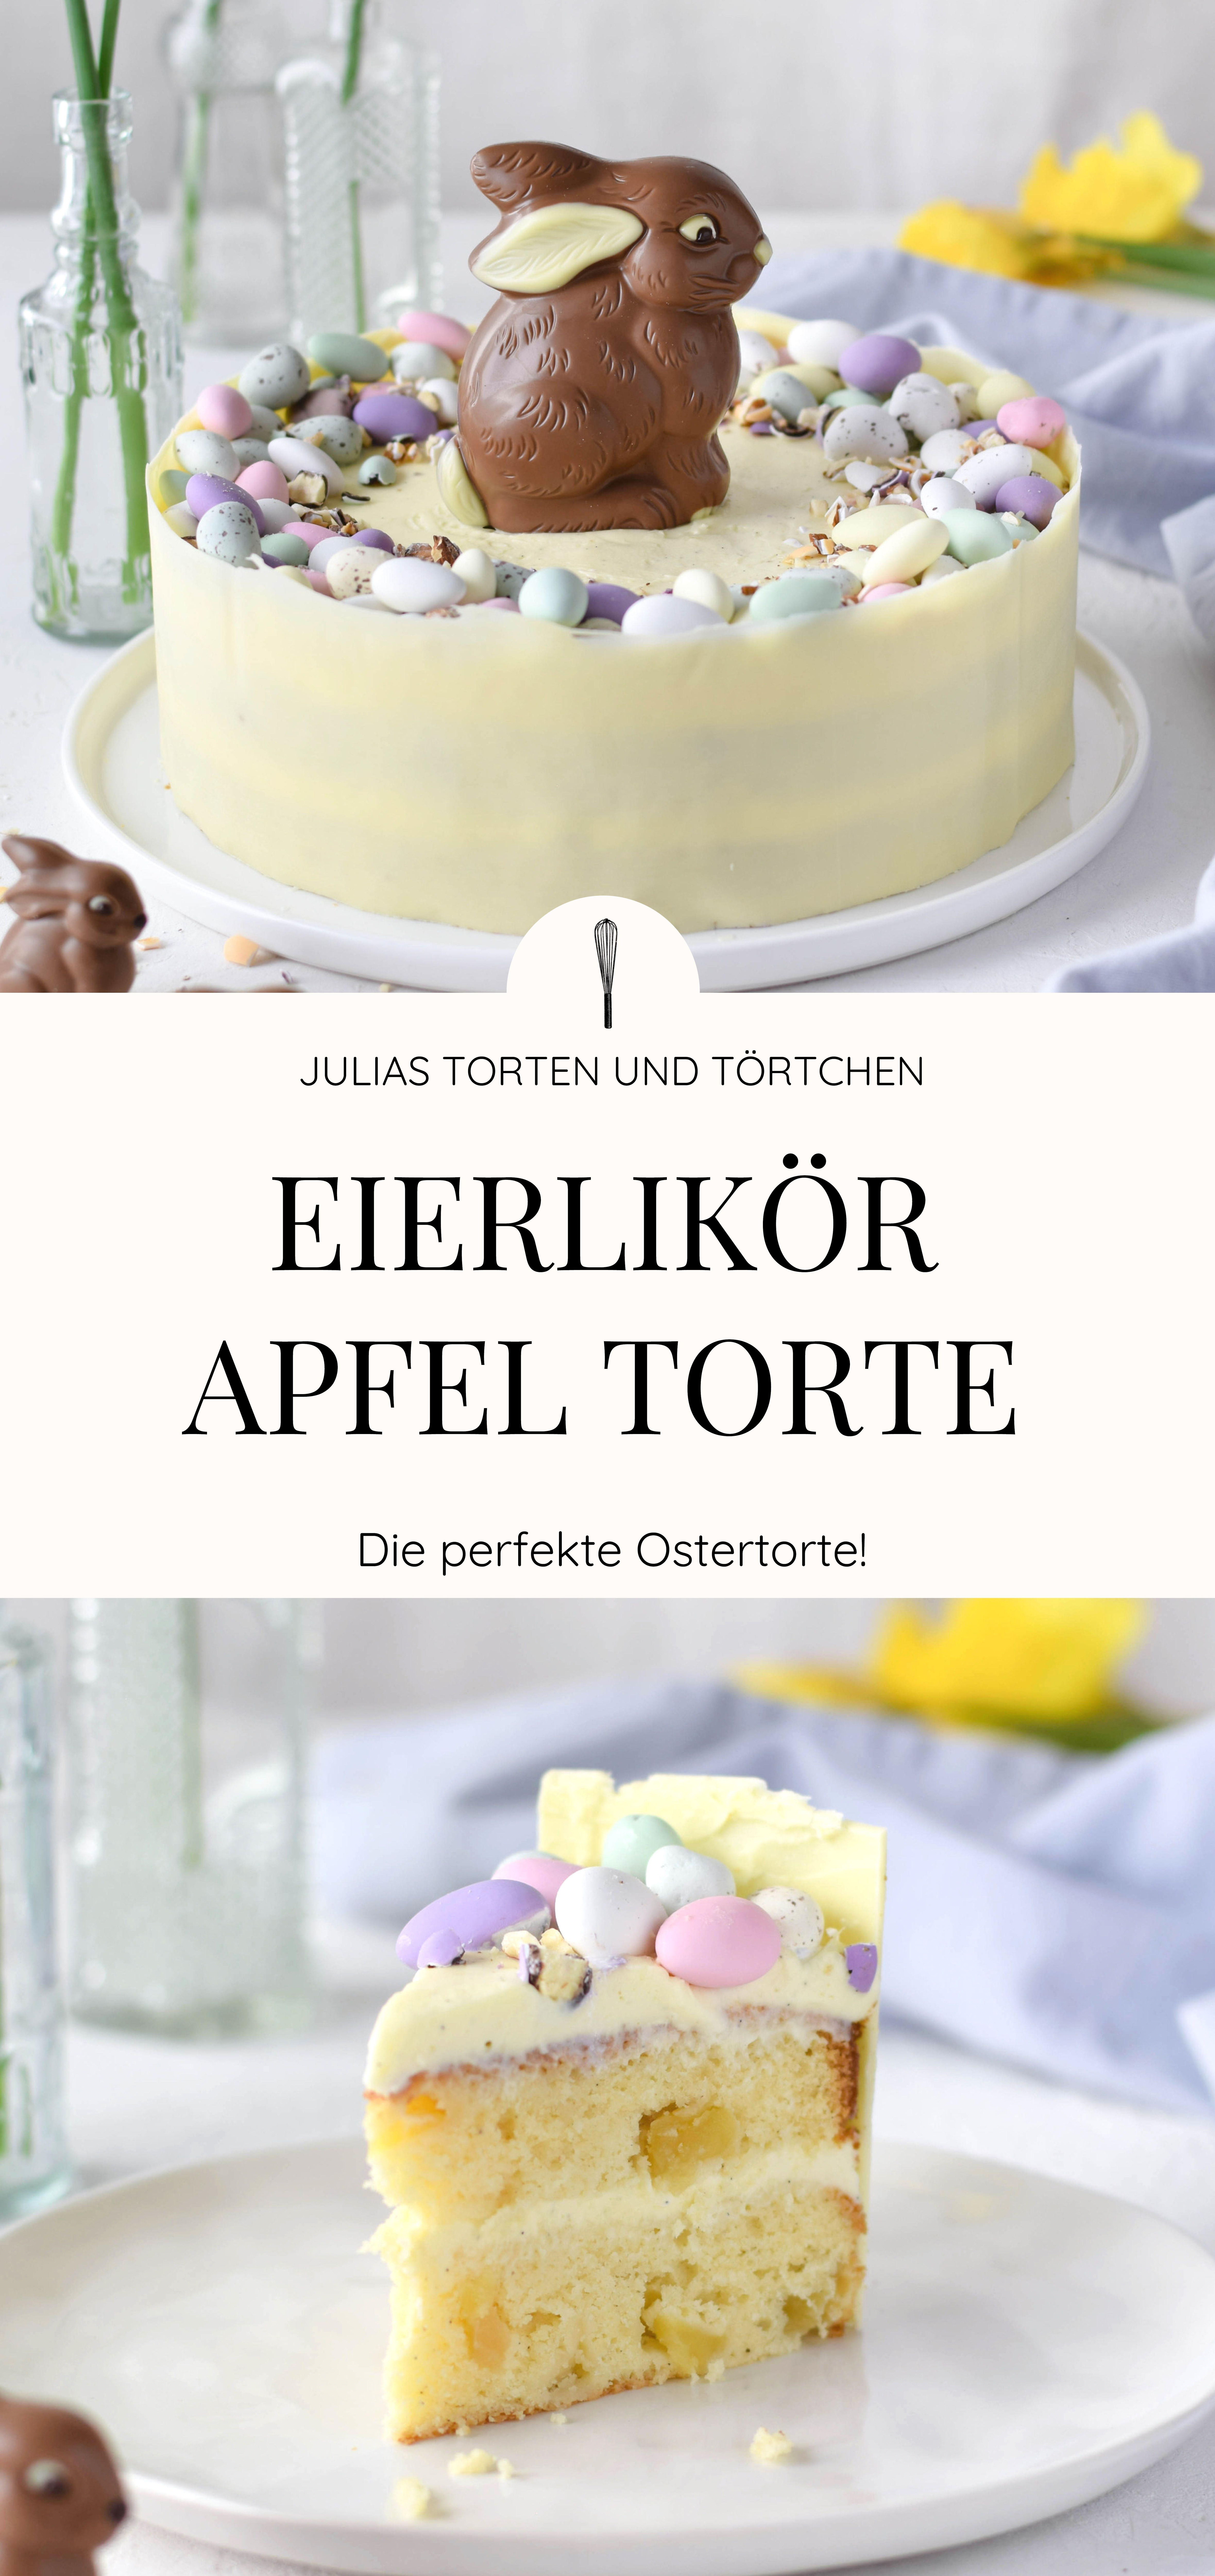 Eggnog Apple Ostertorte – super juicy and very festive!